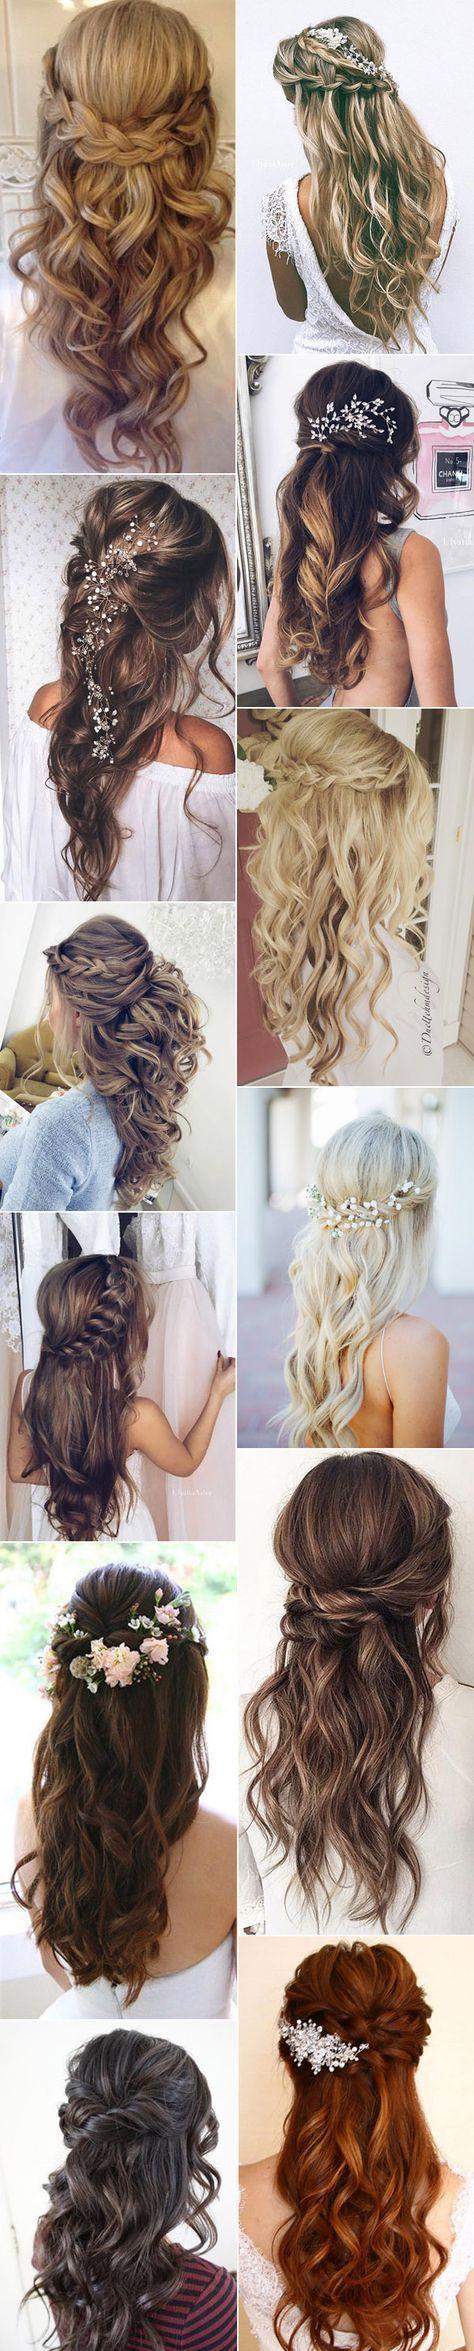 amazing 12 half up half down wedding hairstyles